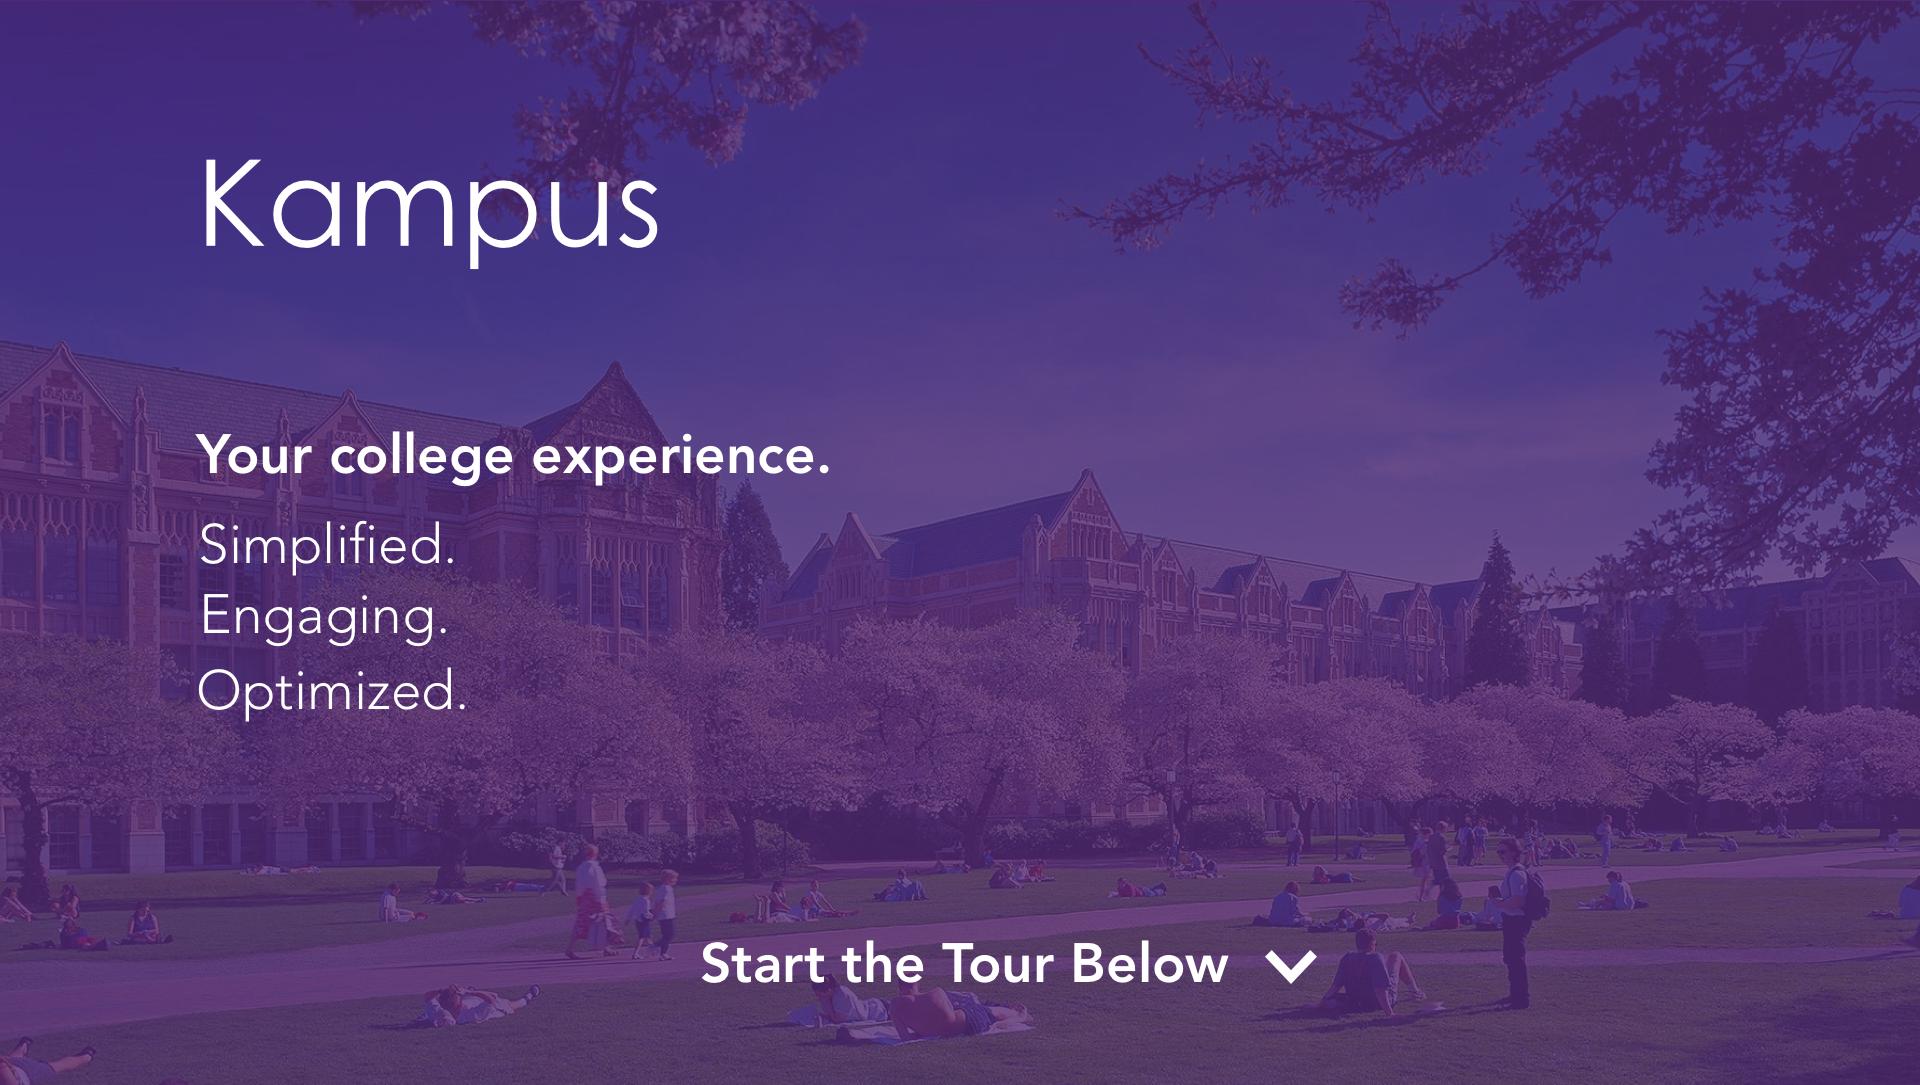 kampus_web1.png